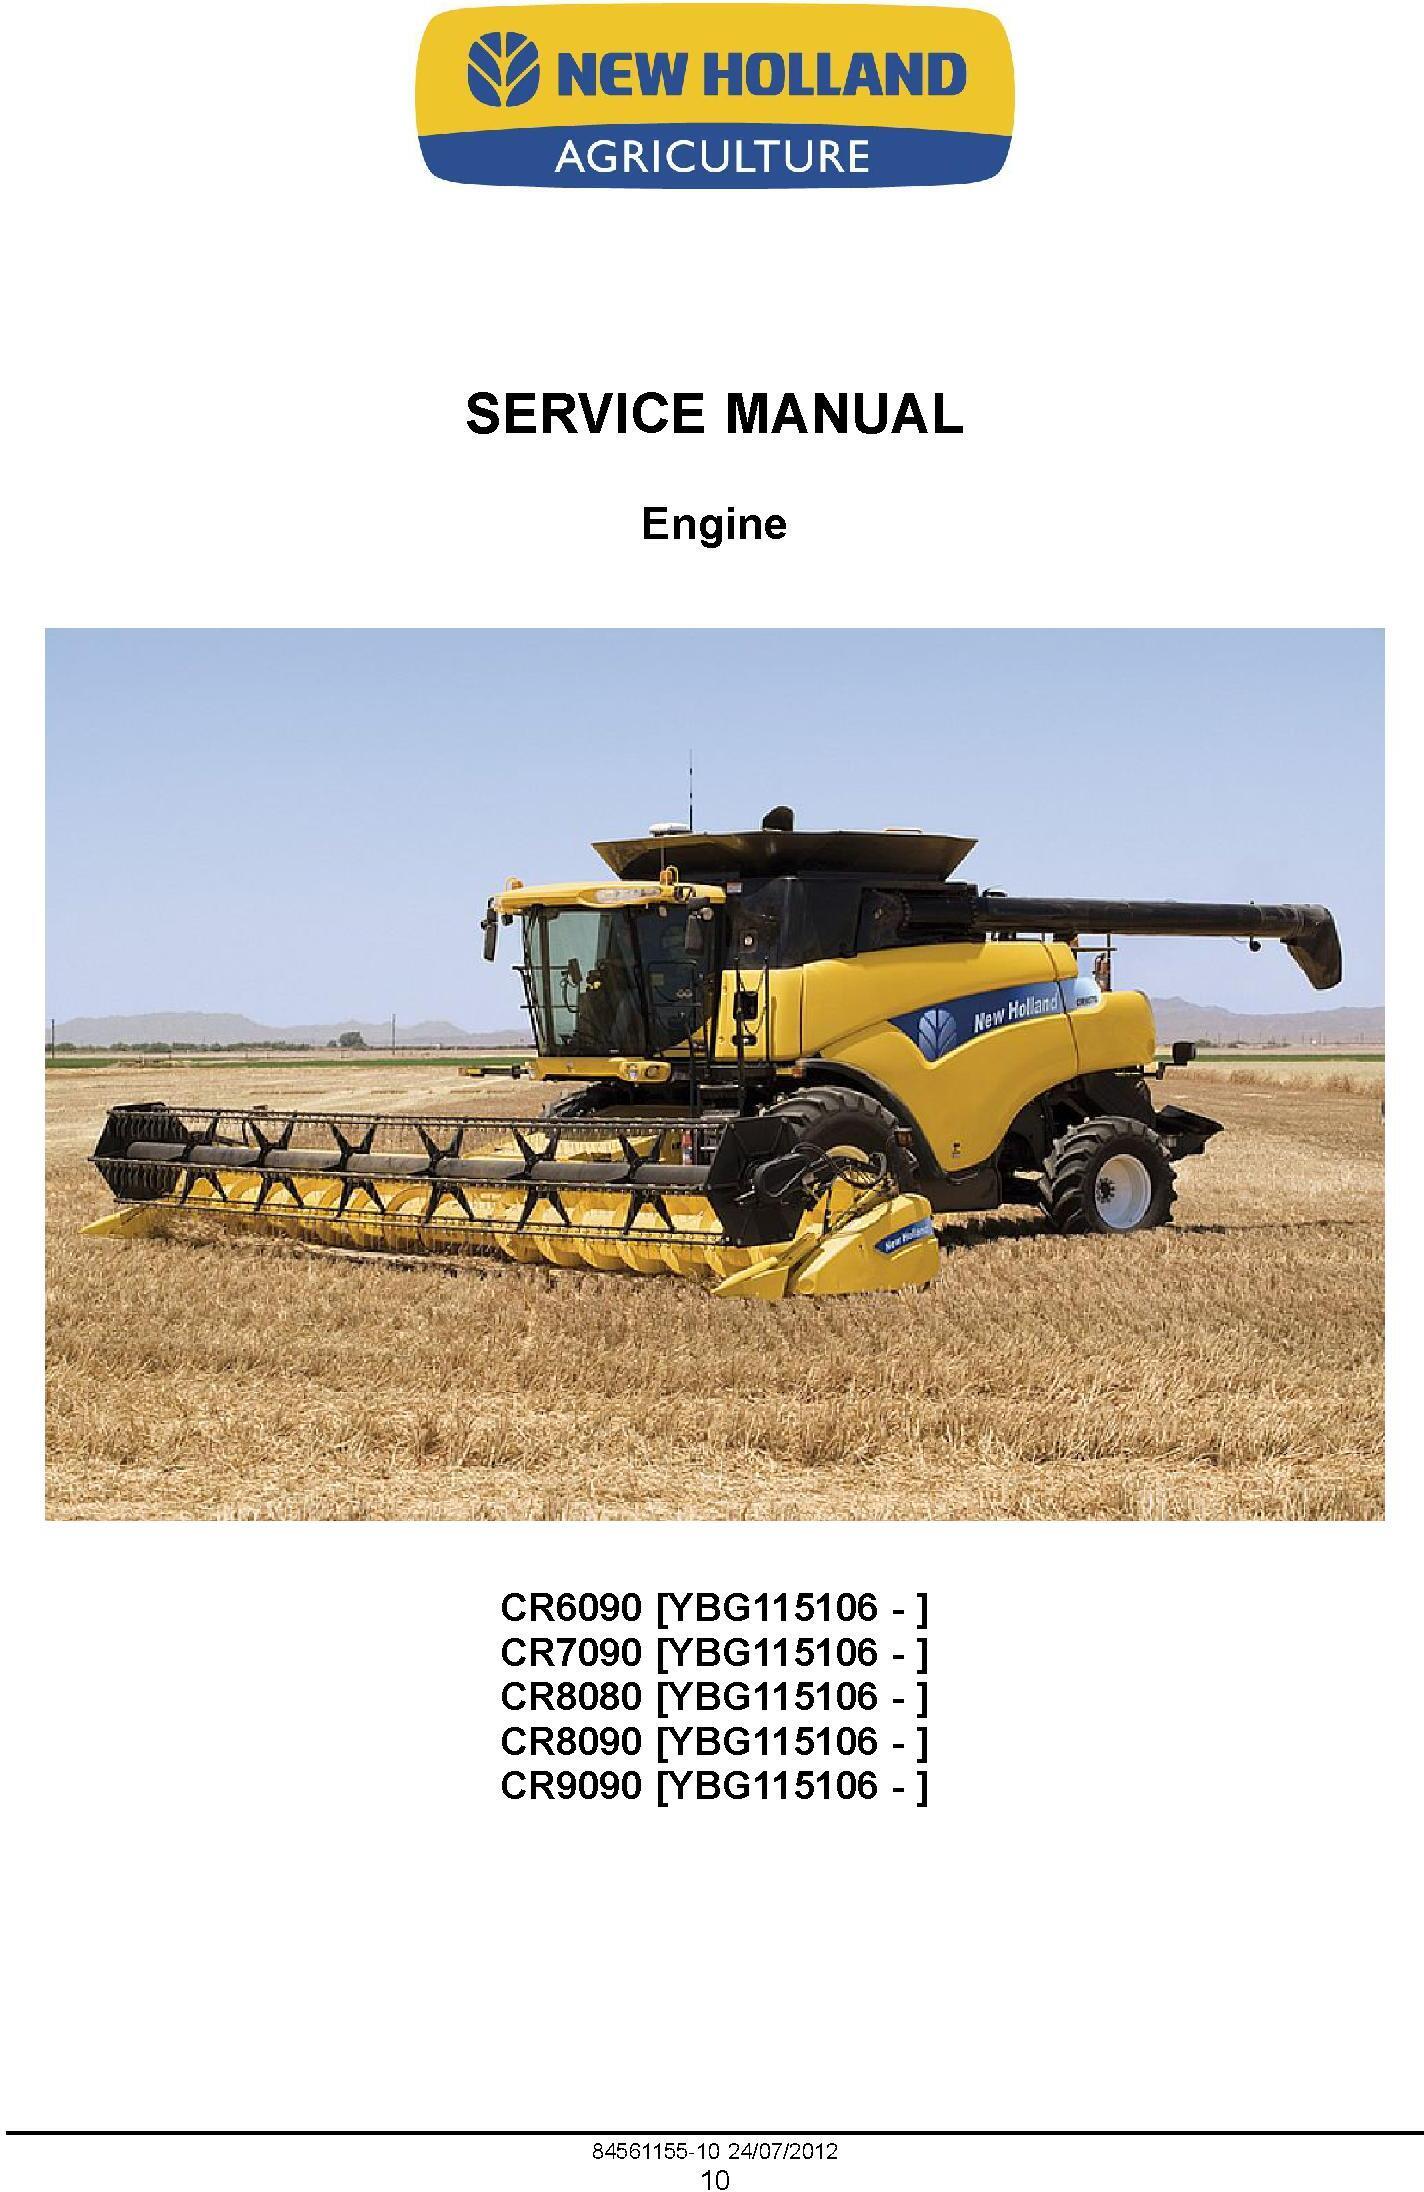 New Holland CR6090, CR7090, CR8080, CR8090, CR9090 Tier 4A Combine Service Manual - 1